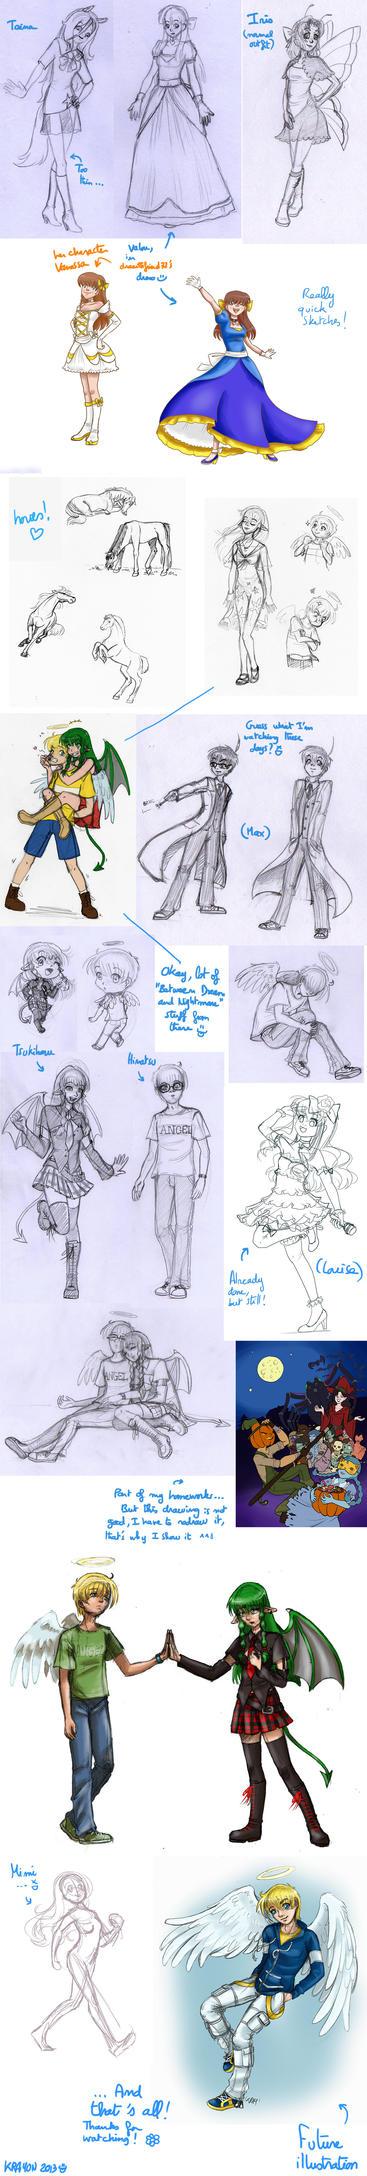 Sketchdump 6 (2013) by Val-Krayon